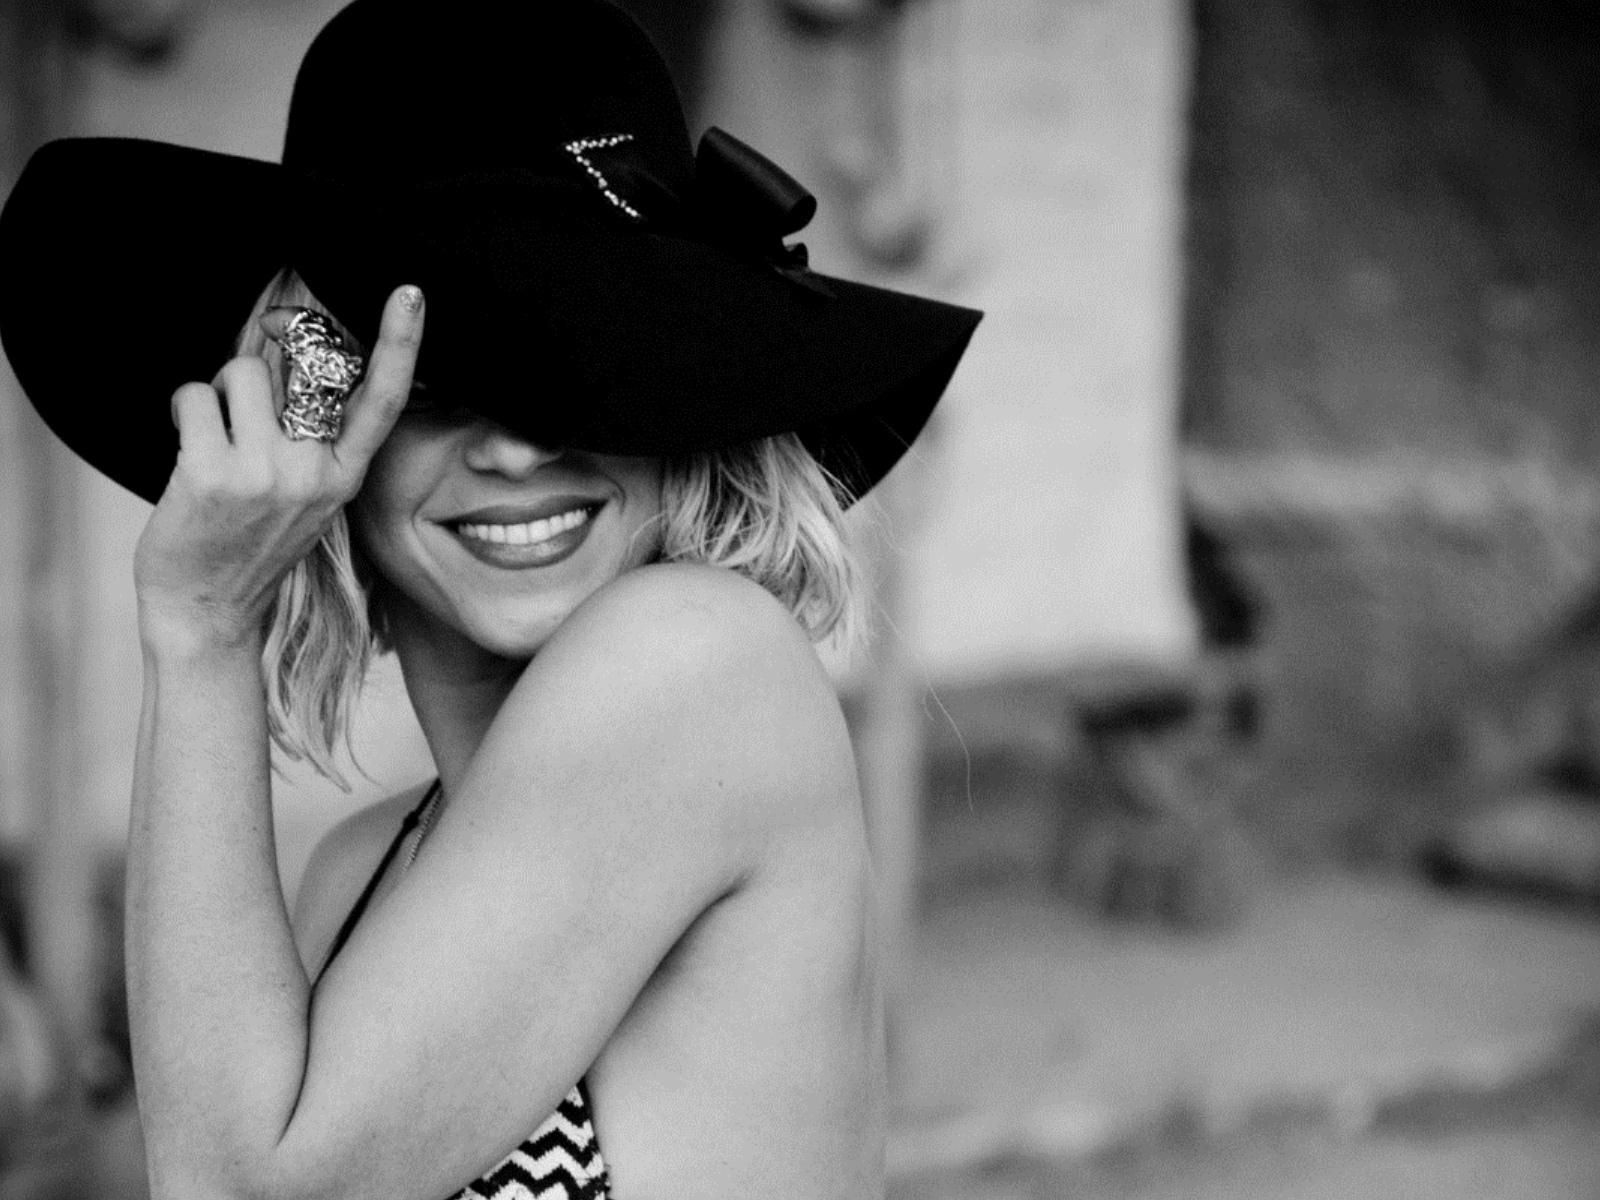 красивые девушки на черно-белых фото